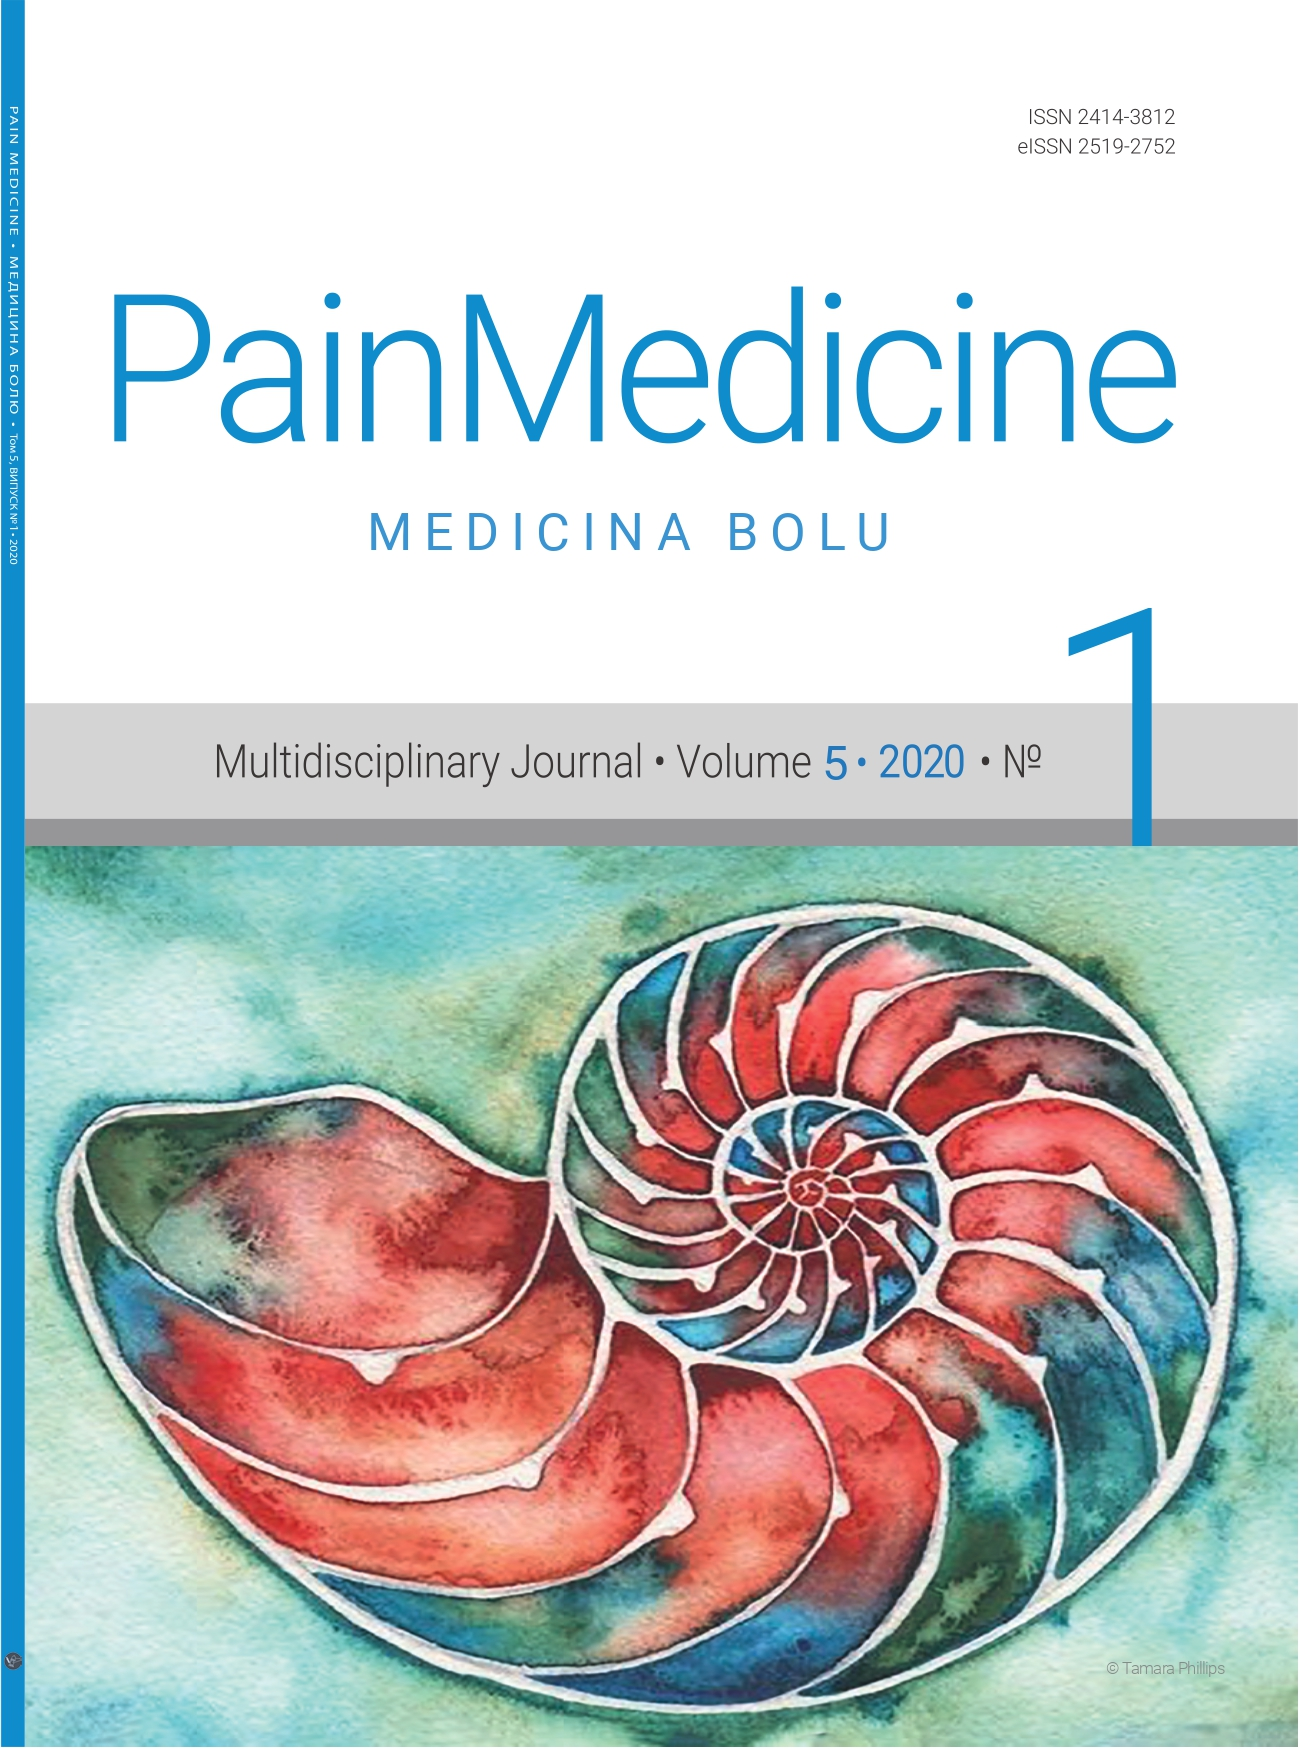 Pain medicine #1 2020